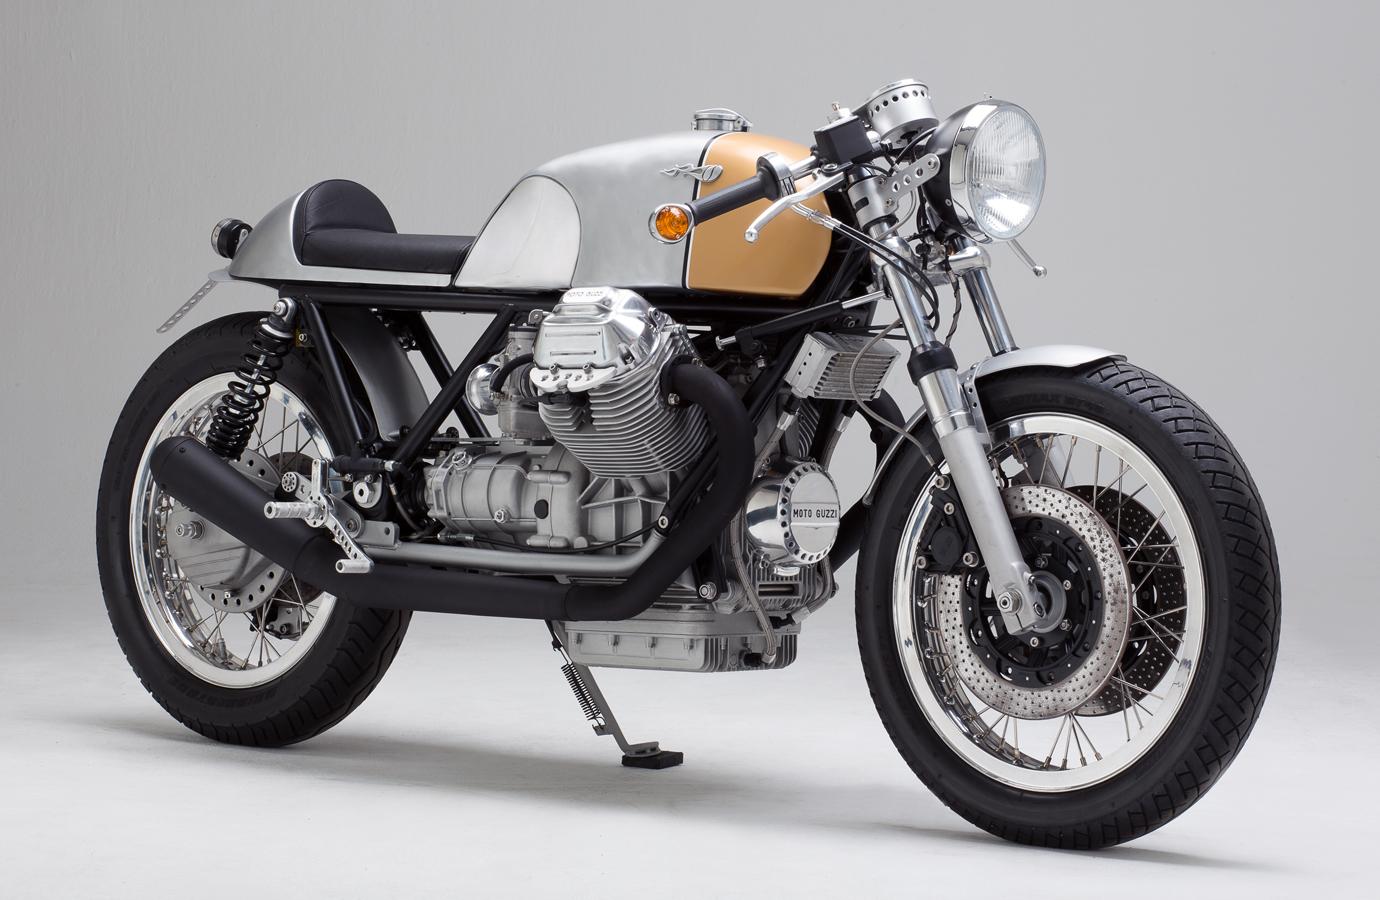 racing caf moto guzzi le mans iii maschine 7 by kaffeemaschine. Black Bedroom Furniture Sets. Home Design Ideas